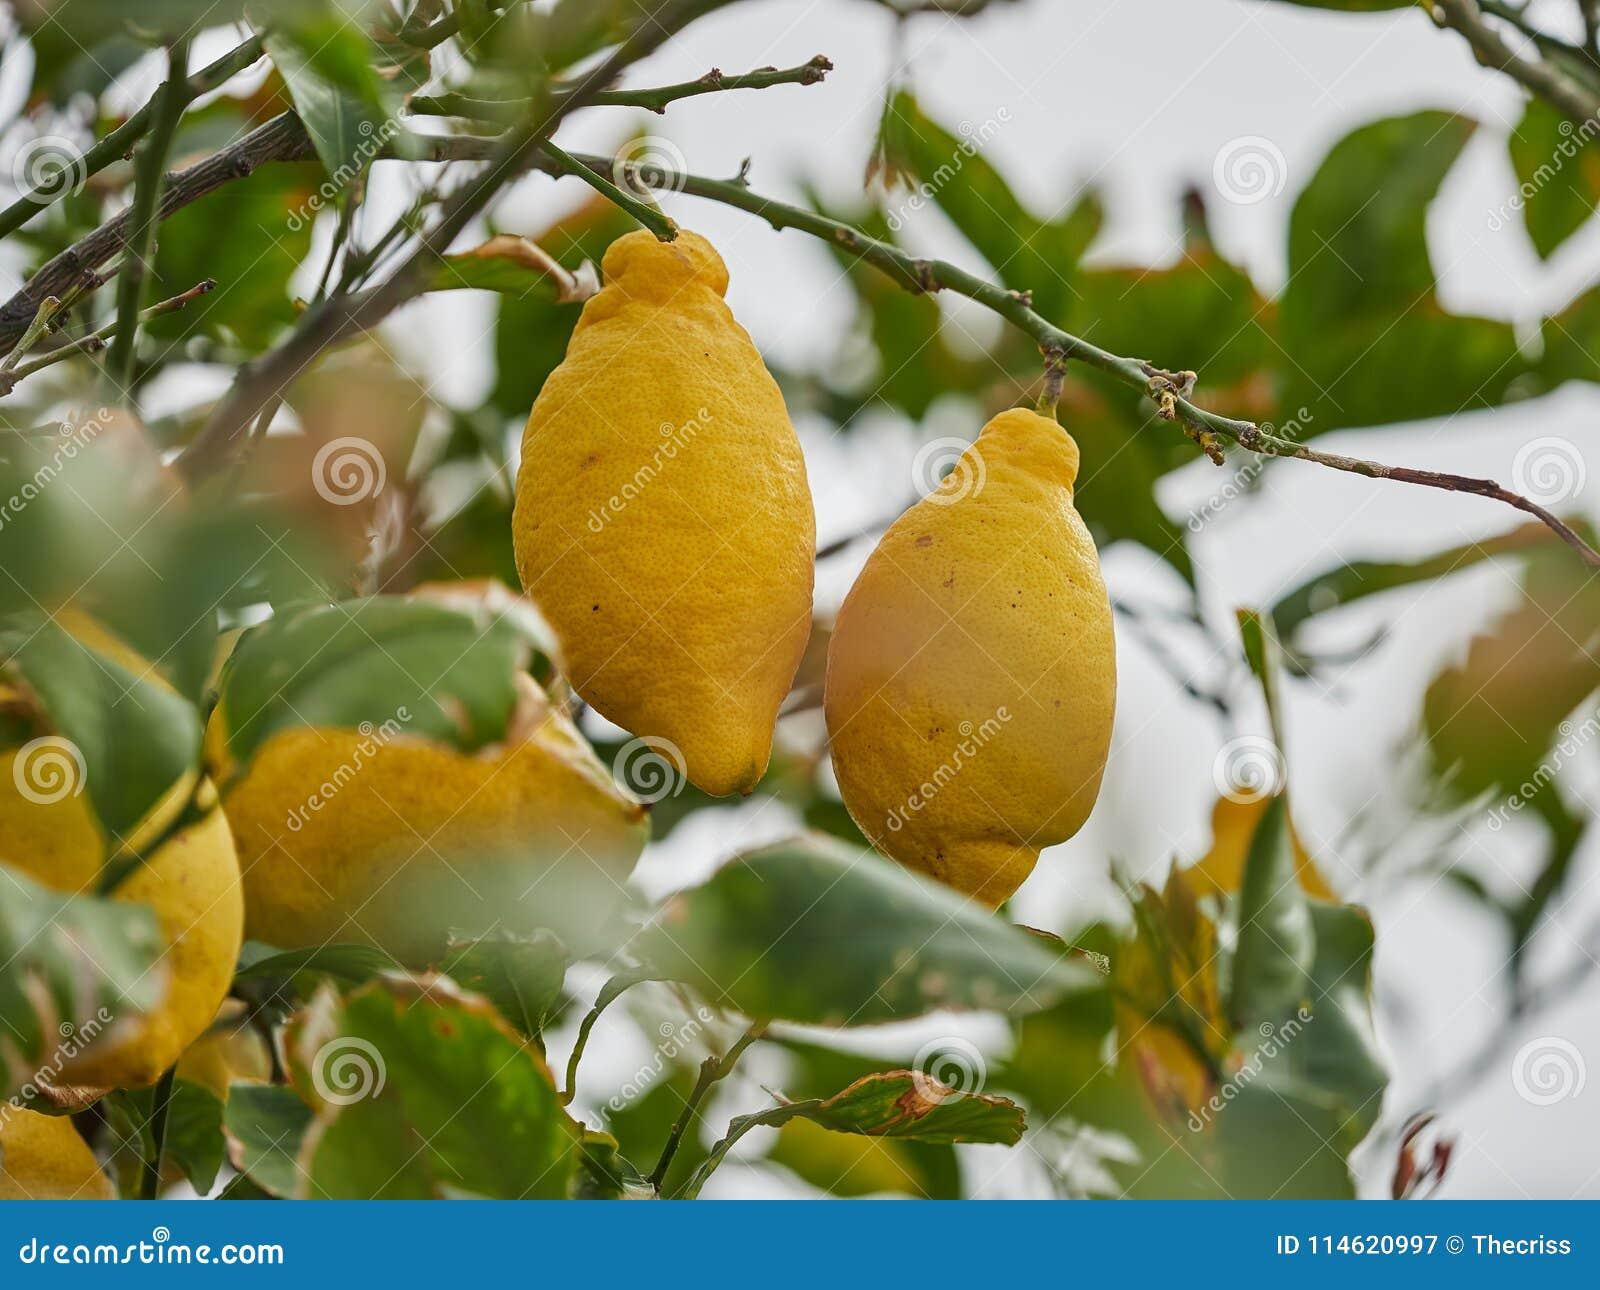 Plump, ripe, juicy lemons ready for harvest in a lemon tree in the Aeolian islands, Sicily, Italy